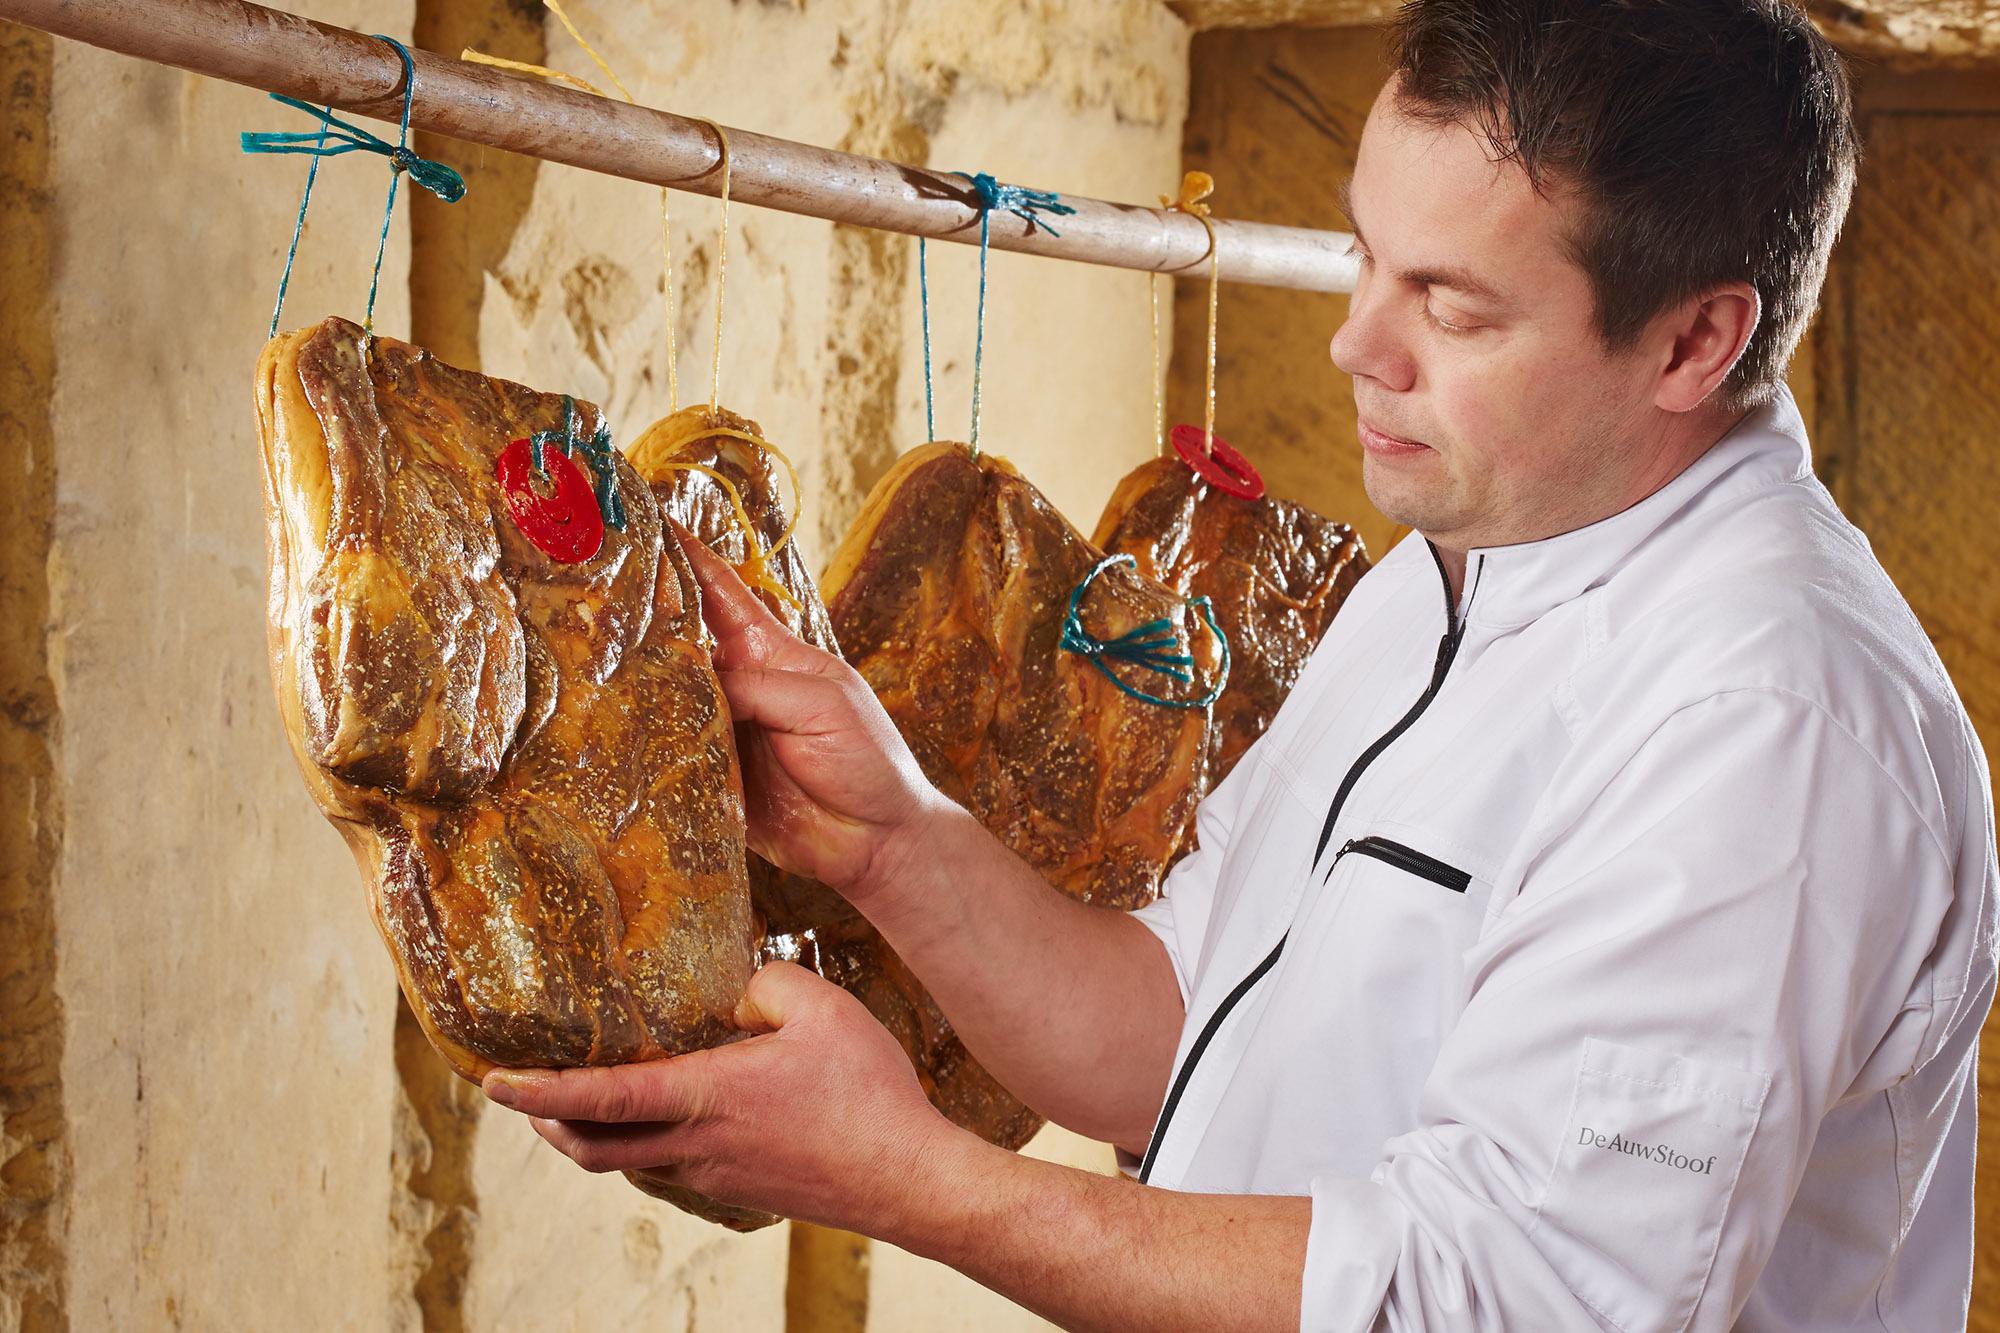 SPUISERS Auwstoof grottenham mergelgrotten Geulhemmer culinair ham